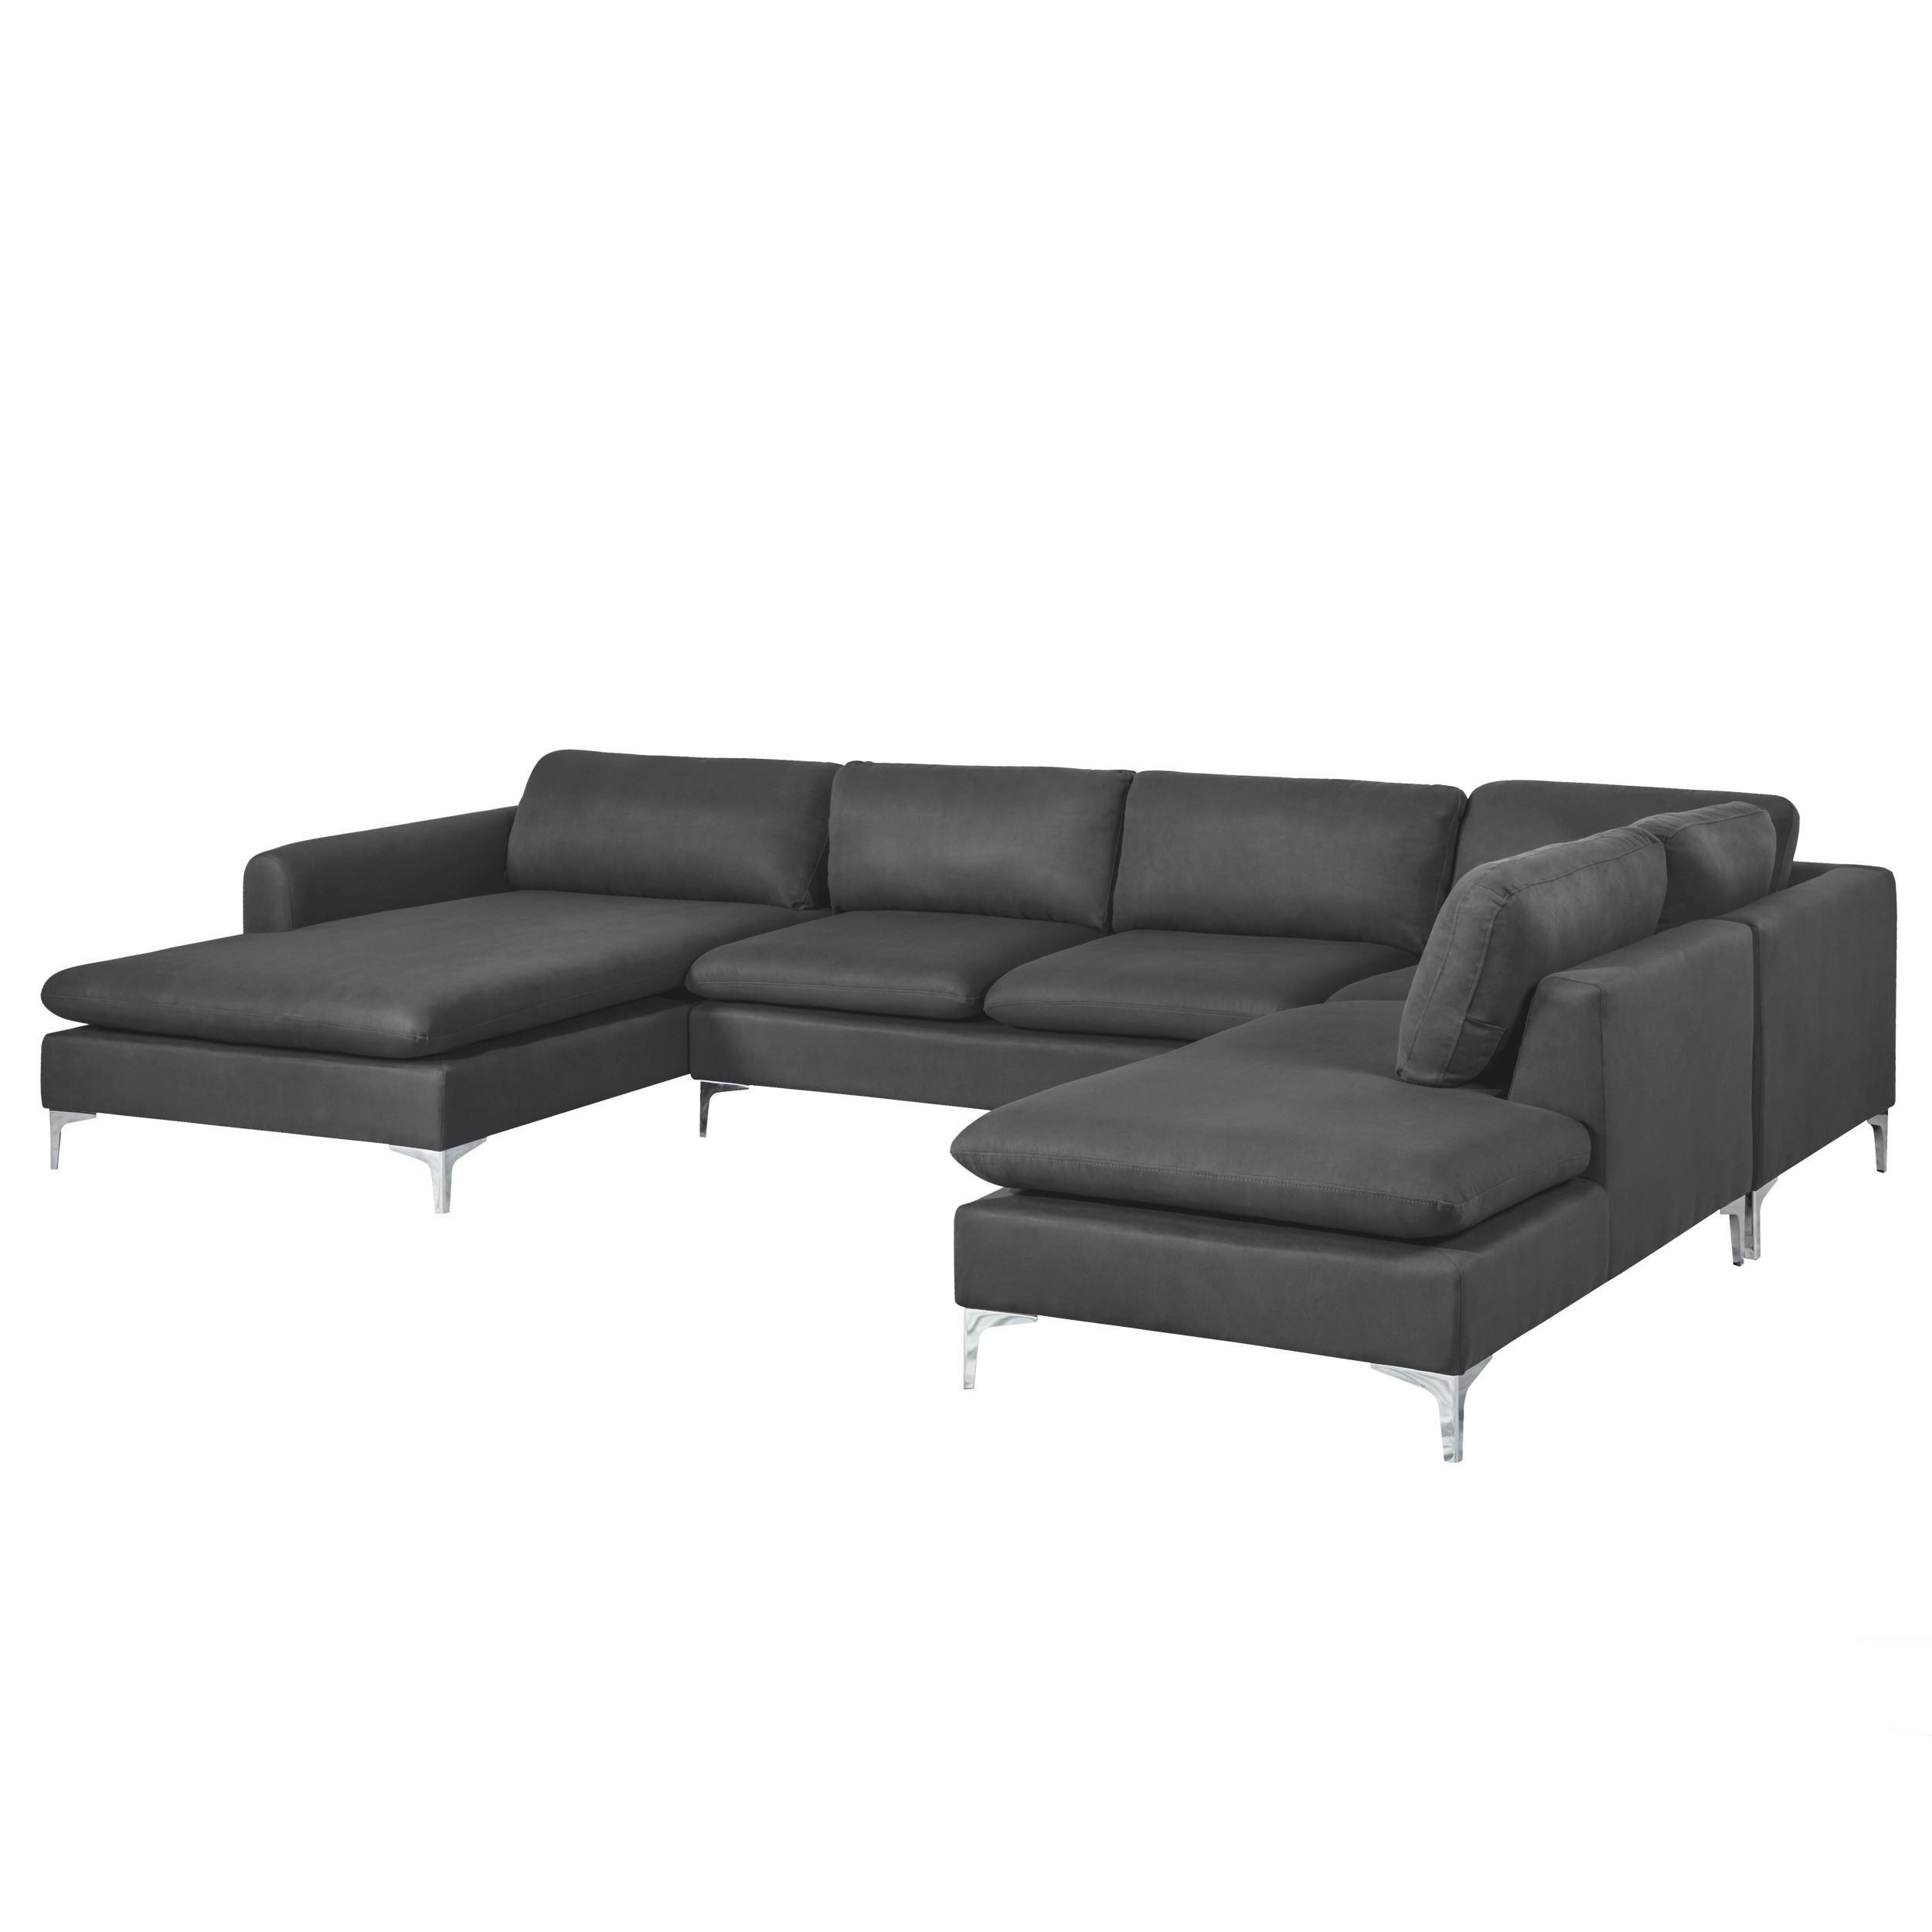 canap d 39 angle cleveland en u gris testez nos canap s d 39 angle cleveland en u gris rdv d co. Black Bedroom Furniture Sets. Home Design Ideas